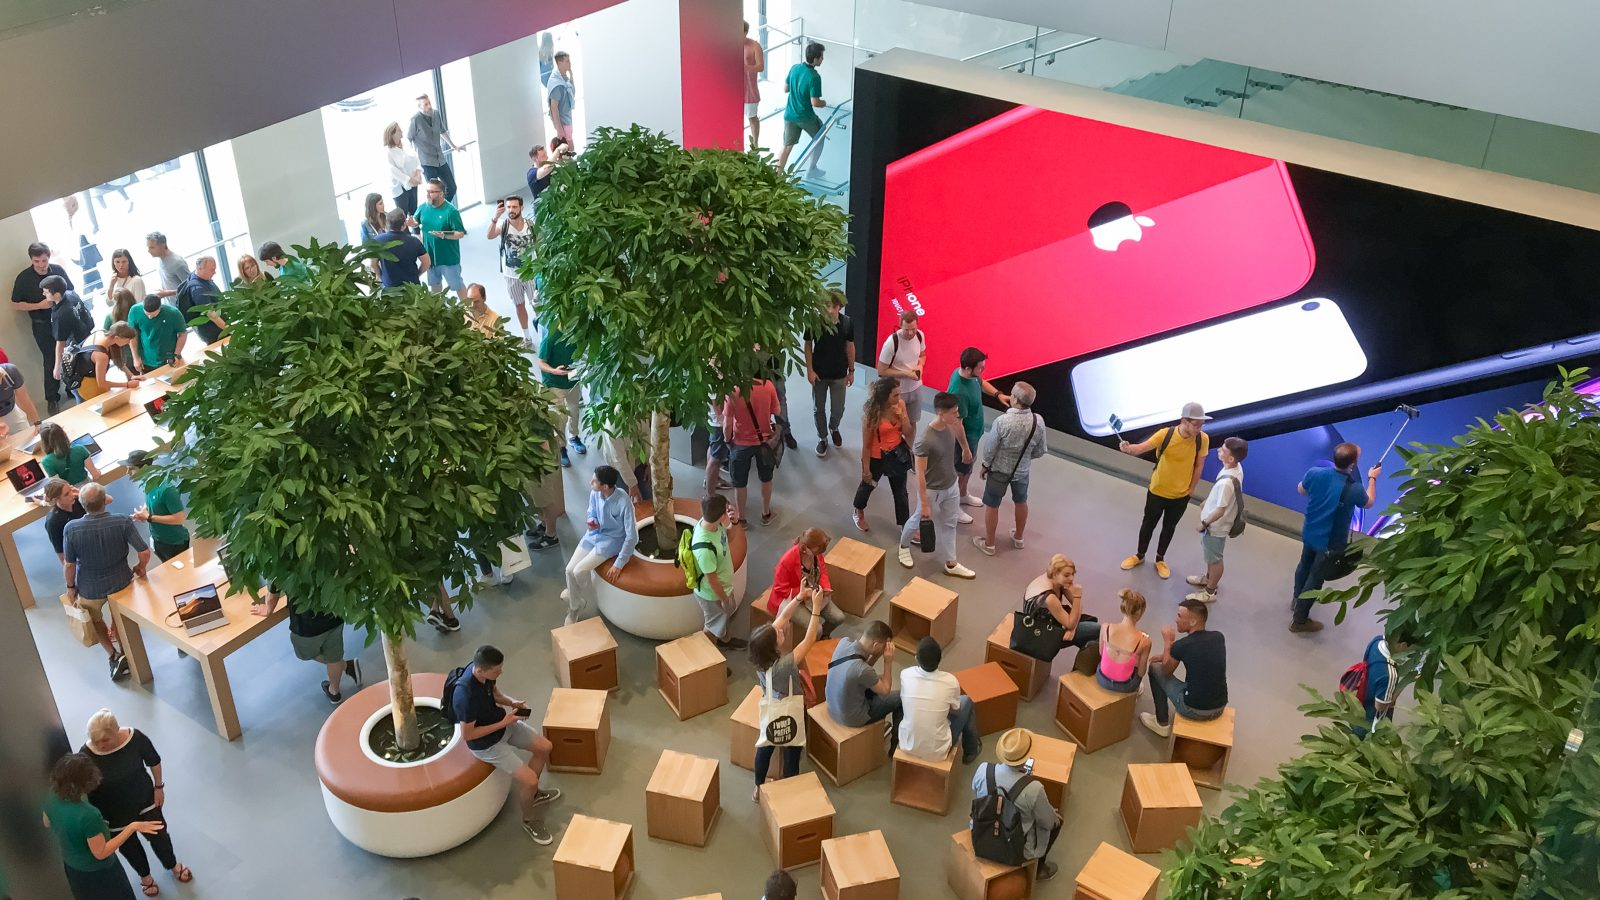 Gallery: Redesigned Apple Passeig de Gràcia opens in Barcelona - 9to5Mac